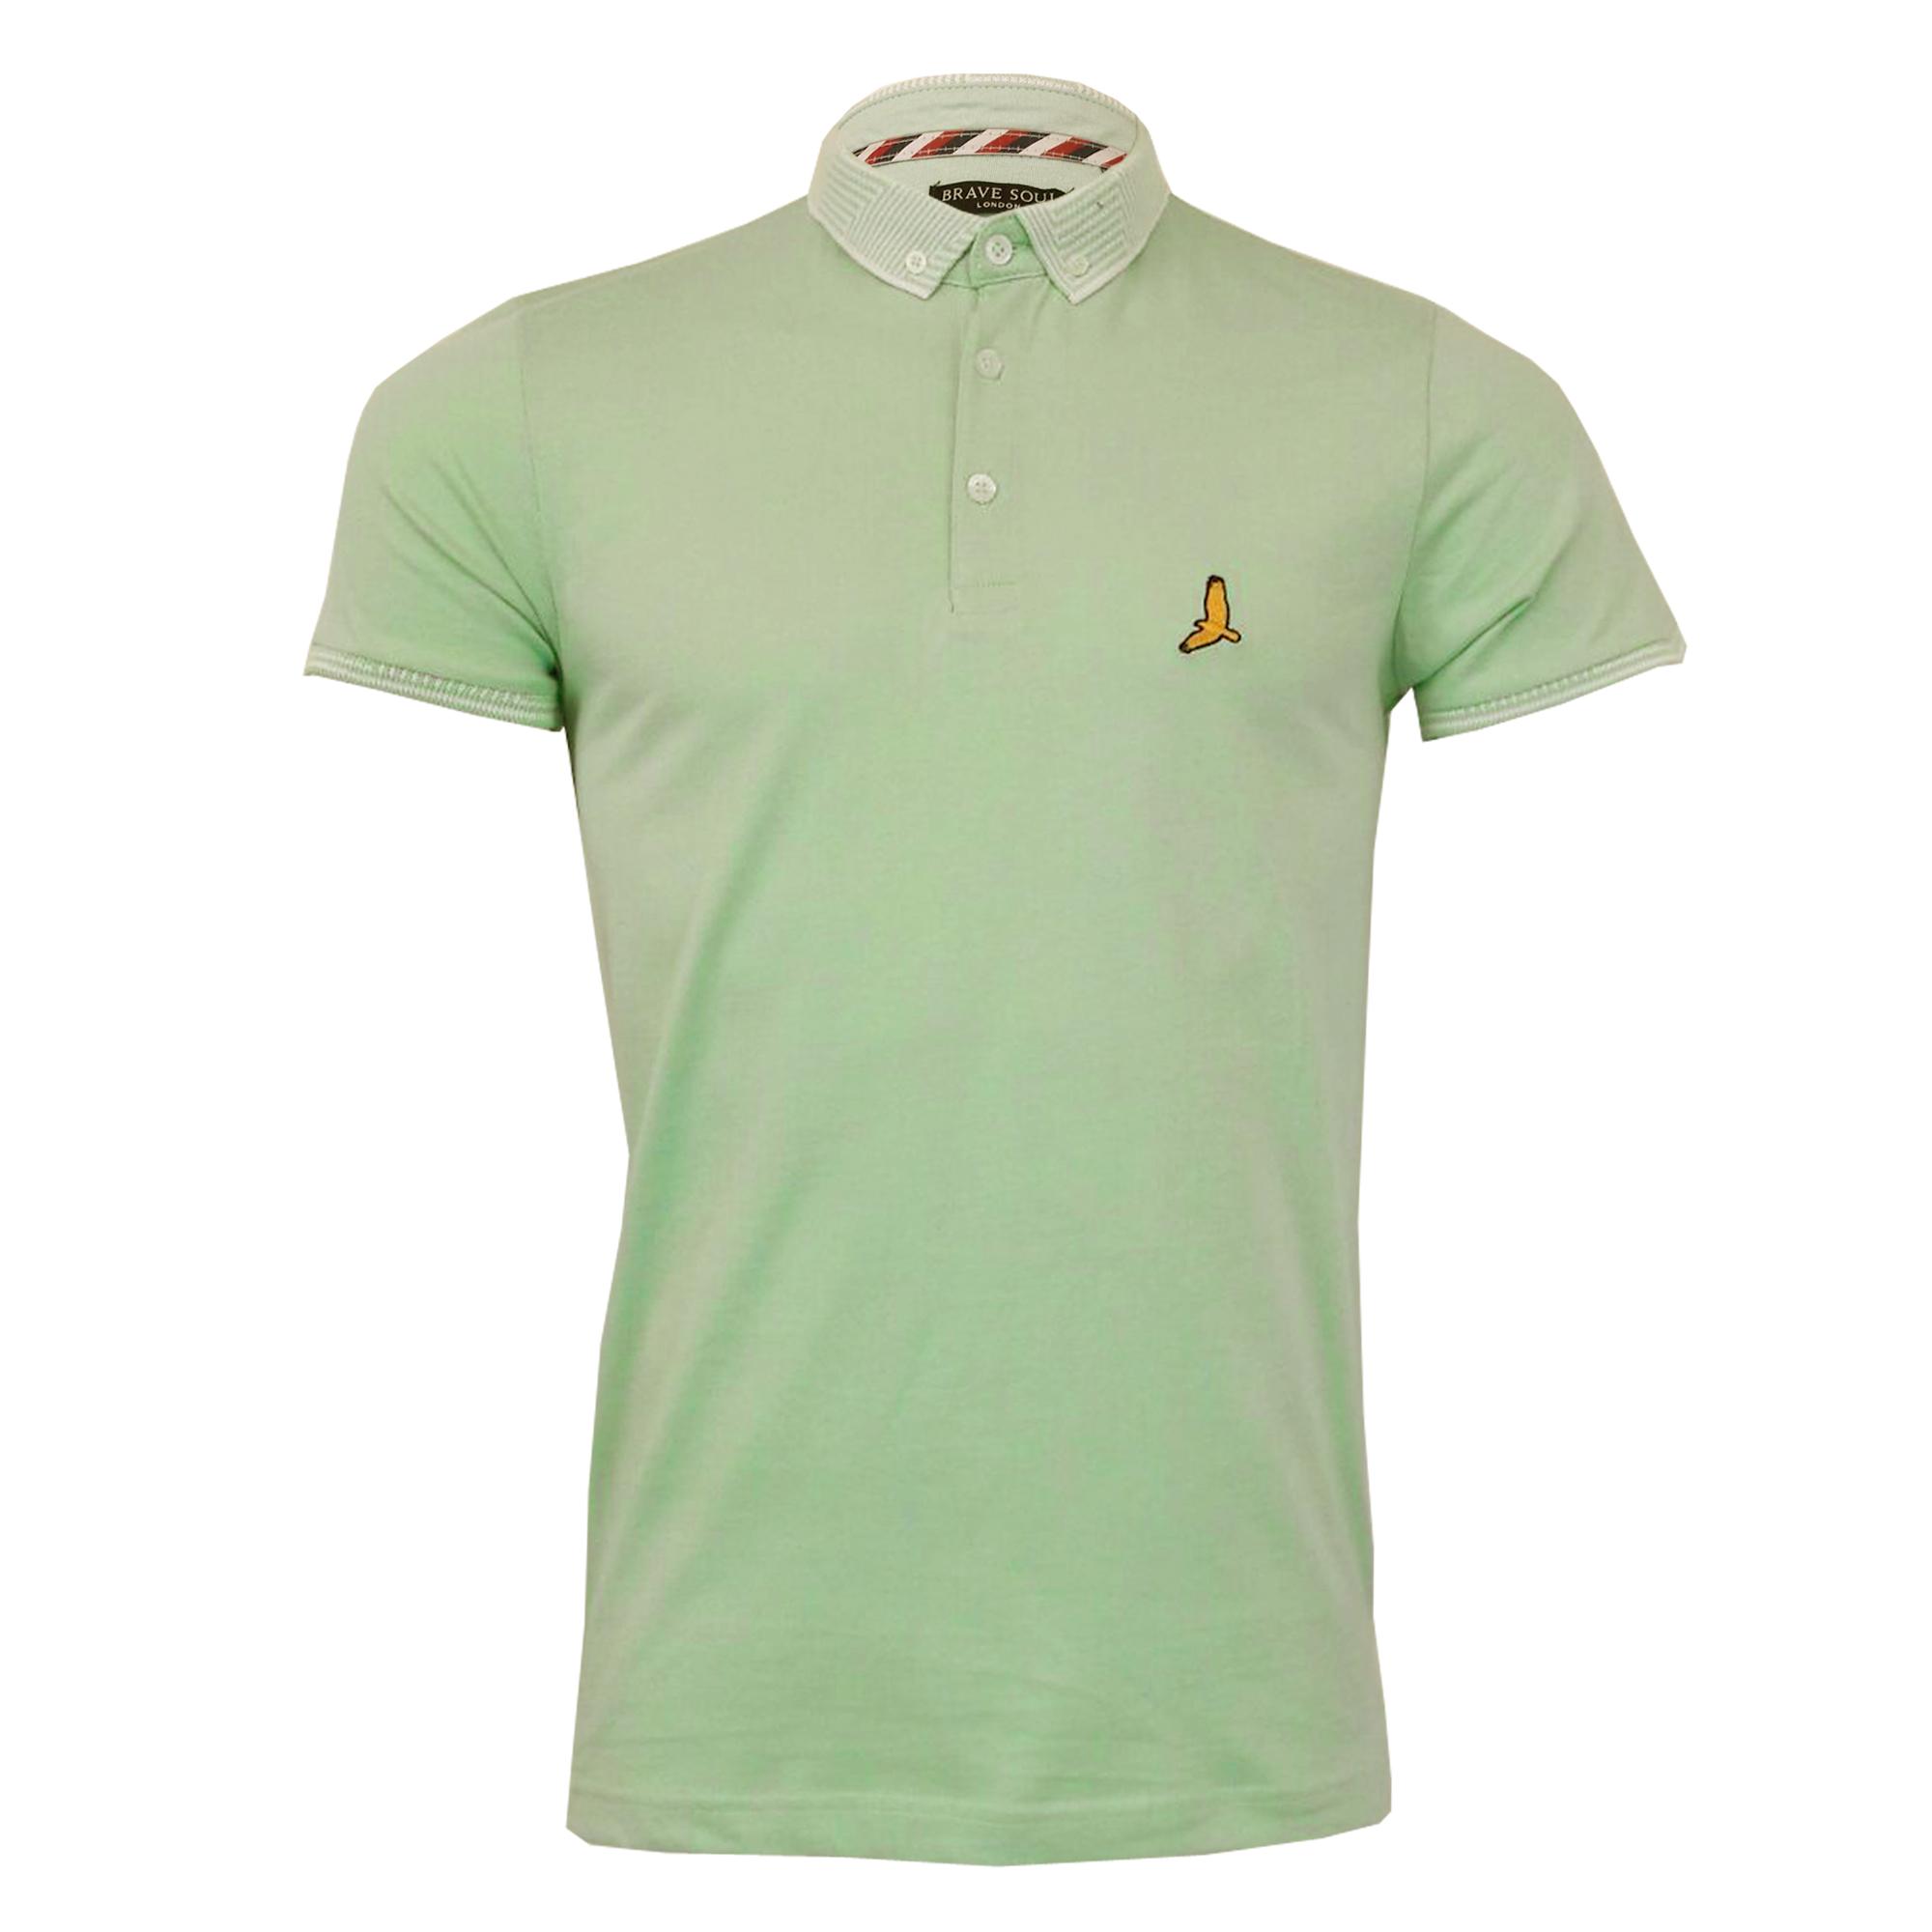 Mens-Polo-T-Shirt-Brave-Soul-Short-Sleeved-Cotton-GLOVER-Collared-KHALIFA-Summer thumbnail 8